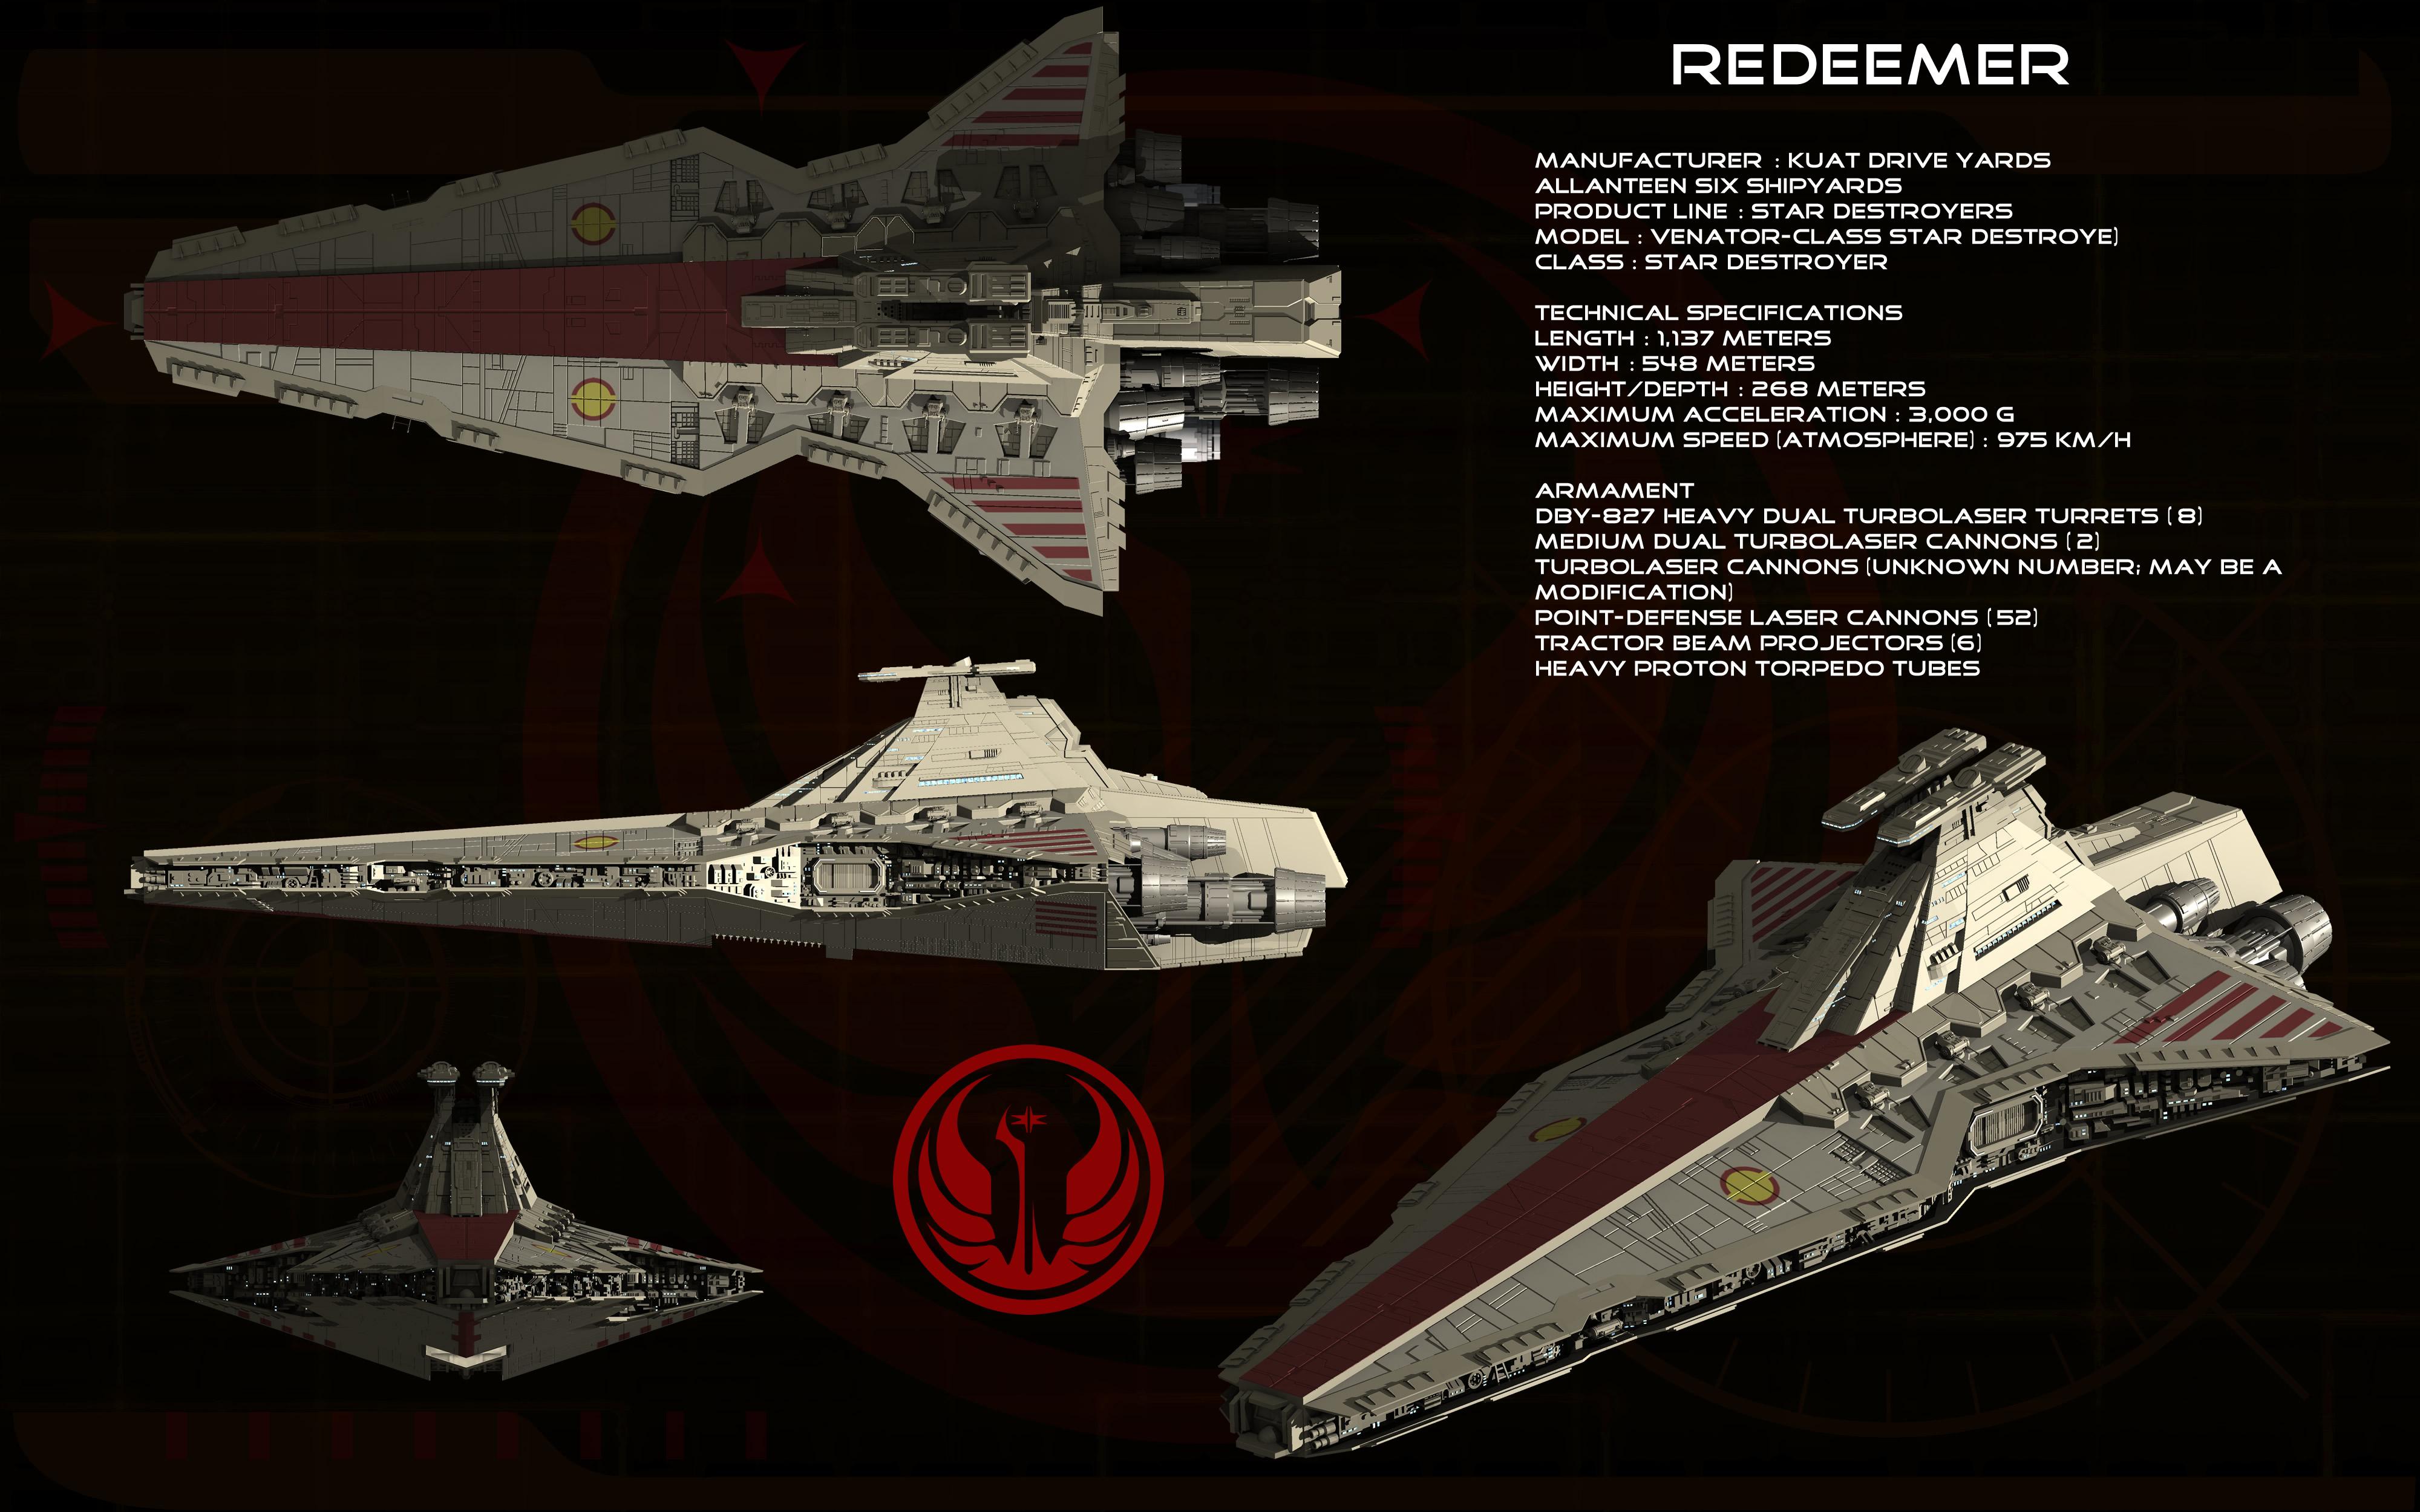 star destroyer ipad wallpaper